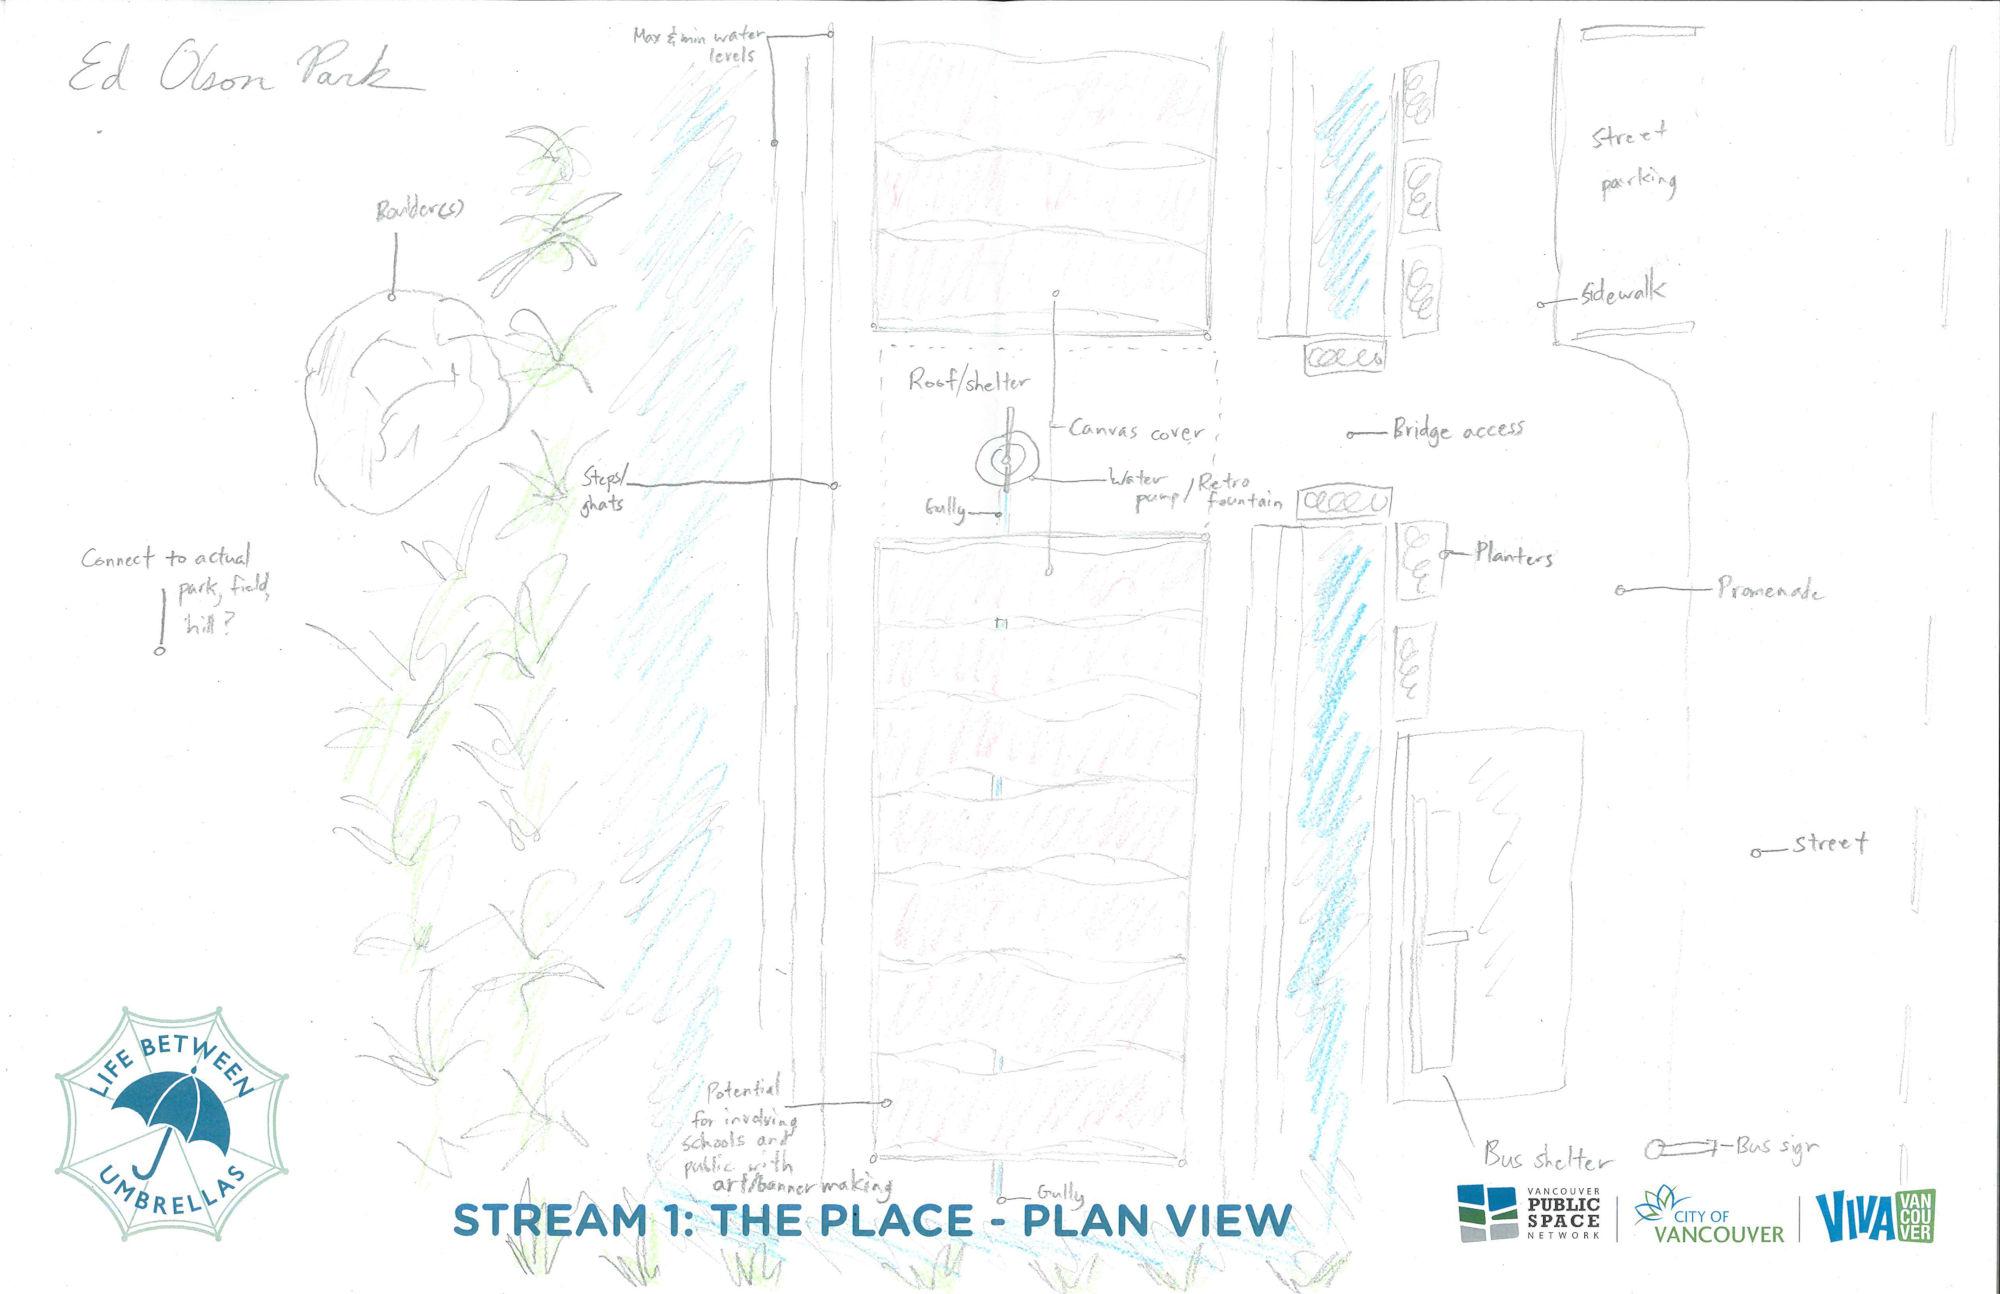 A34 - Ed Olson Park - Drawing-2.jpg